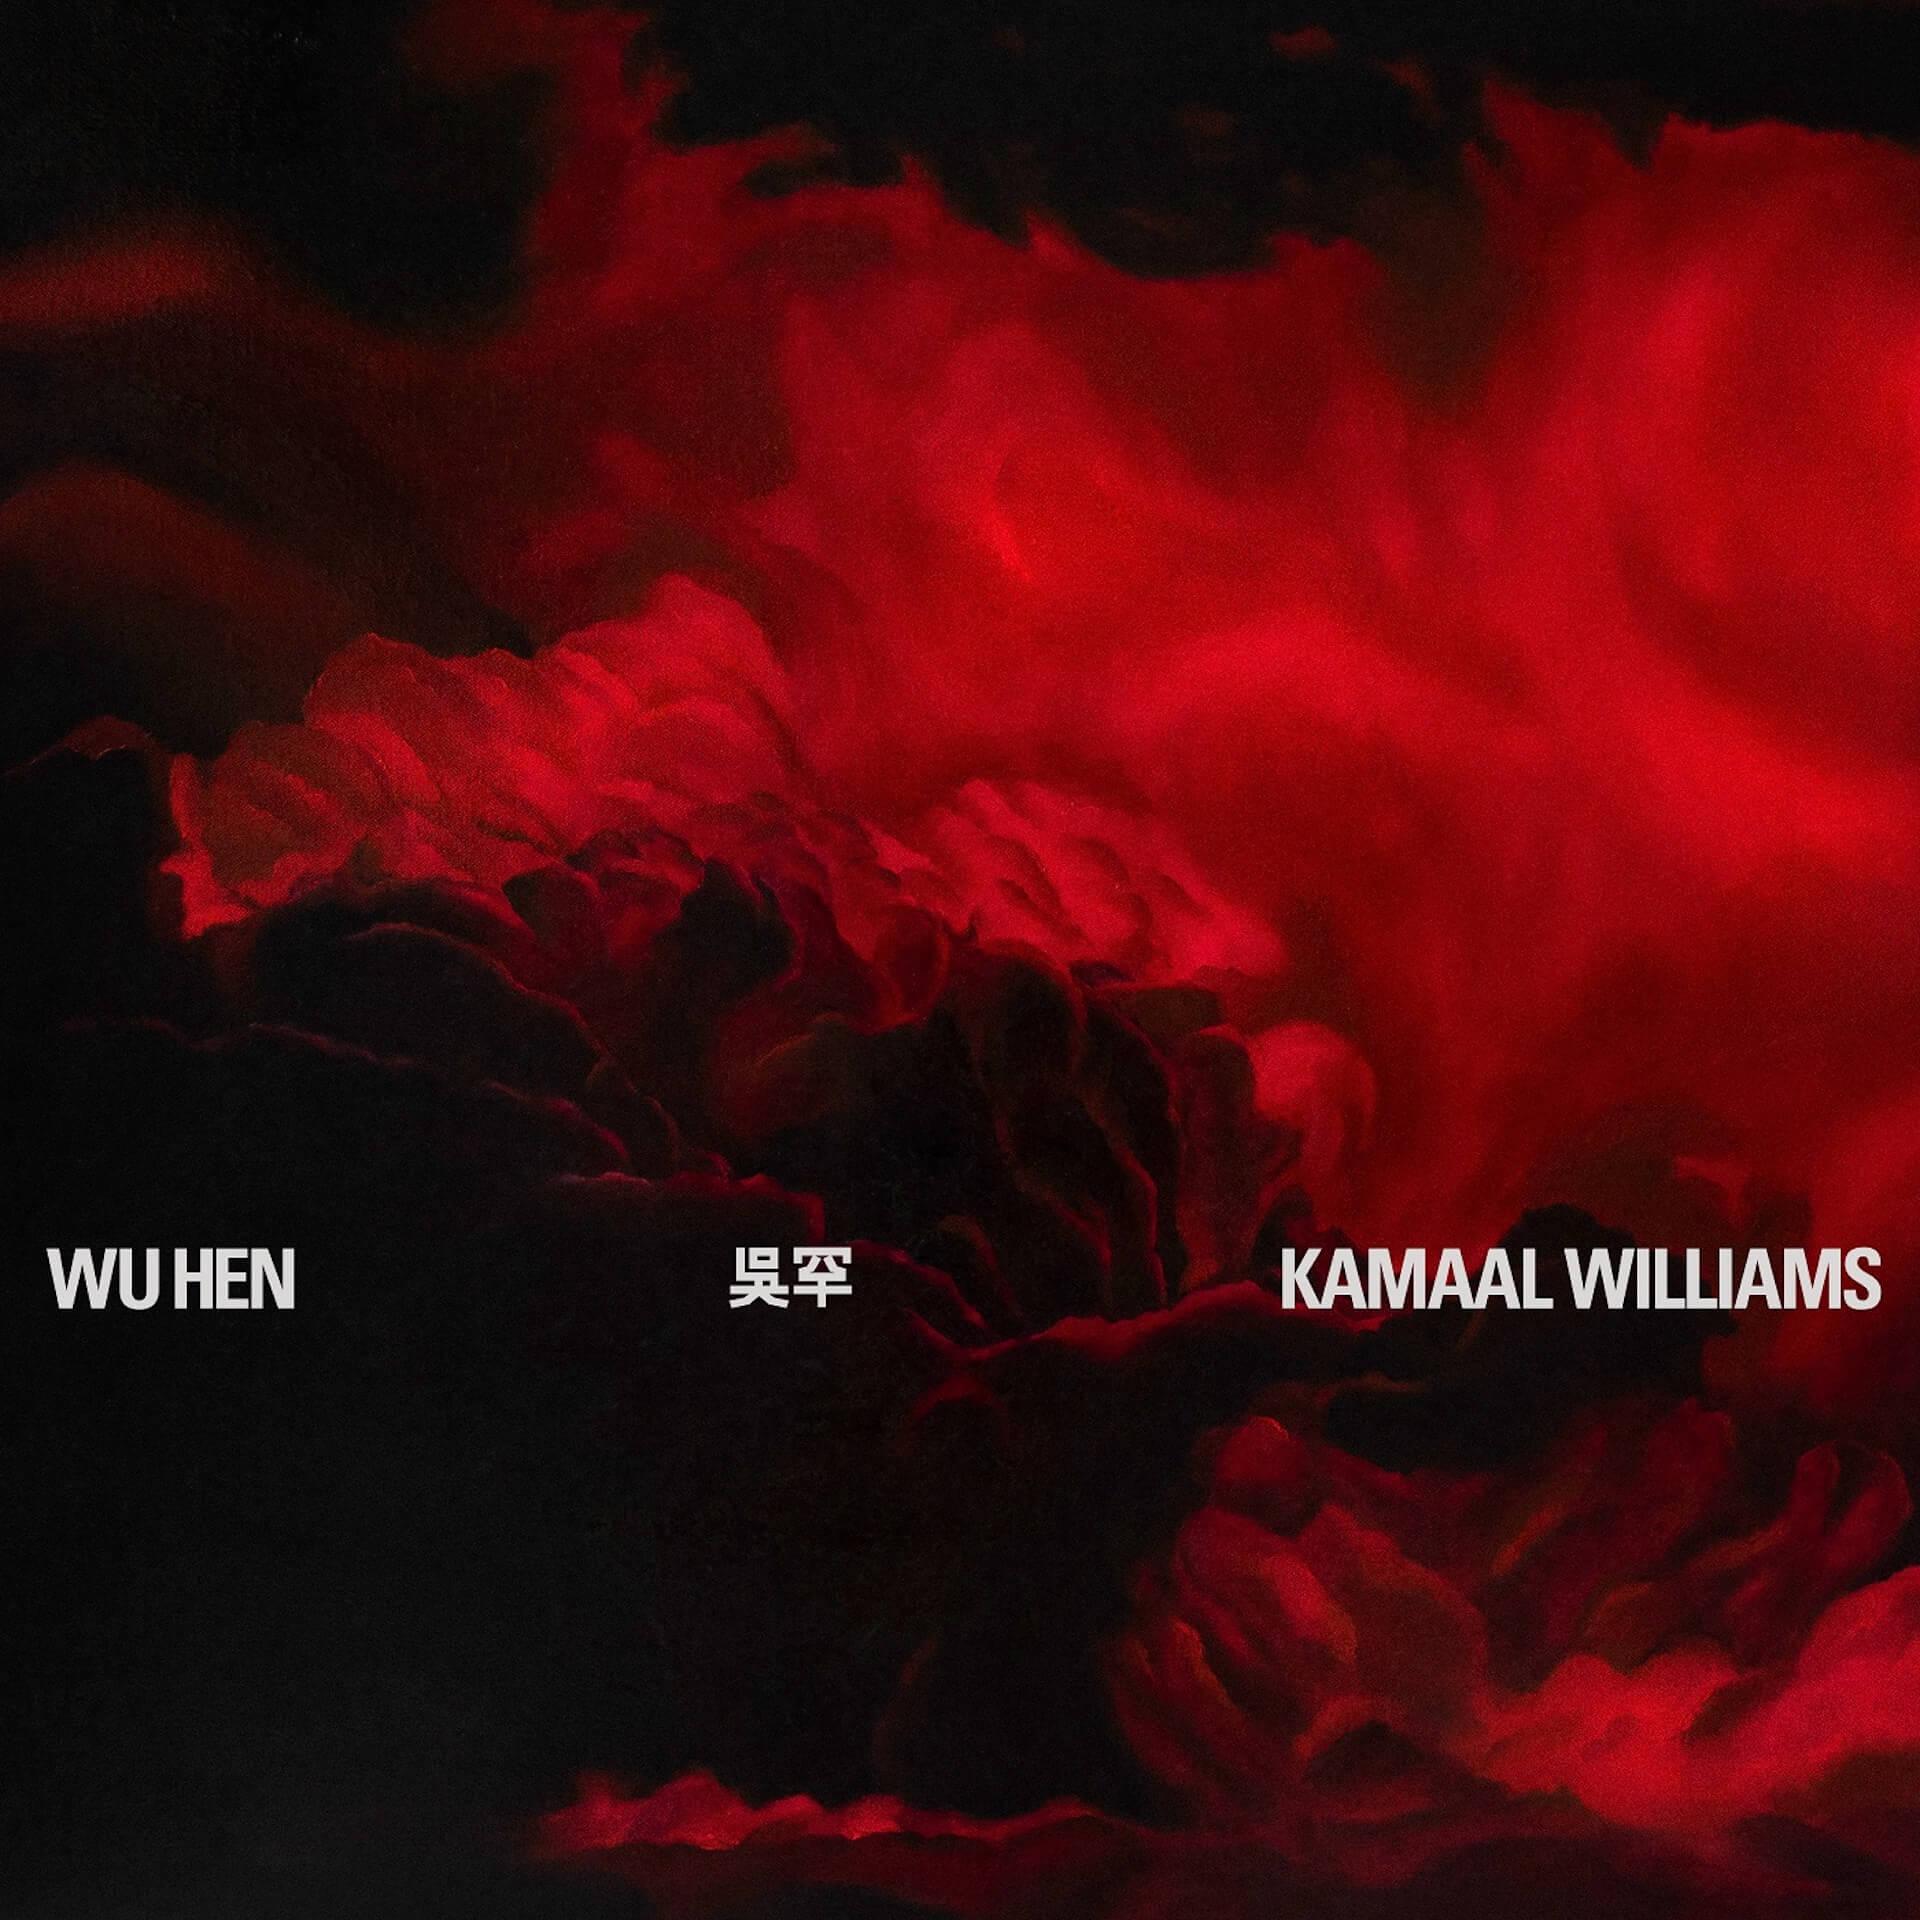 Kamaal Williamsの最新アルバム『Wu Hen』リリース記念!〈Black Focus〉オフィシャルTシャツが発売決定 music200728_kamaalwilliams_3